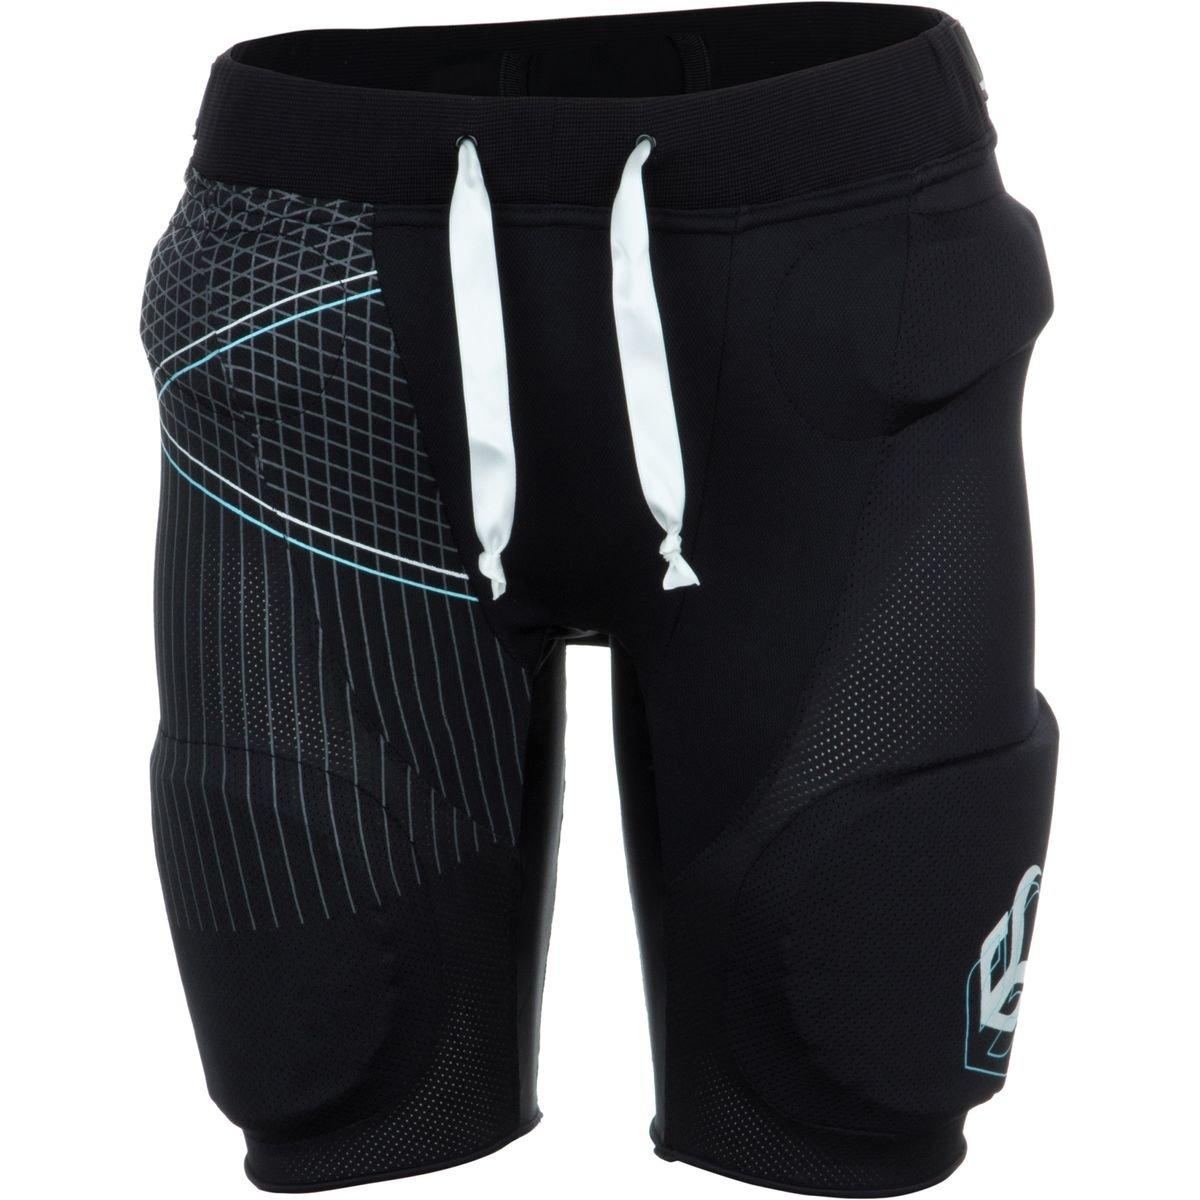 Demon FlexForce Pro Womens Protective Shorts Medium Black